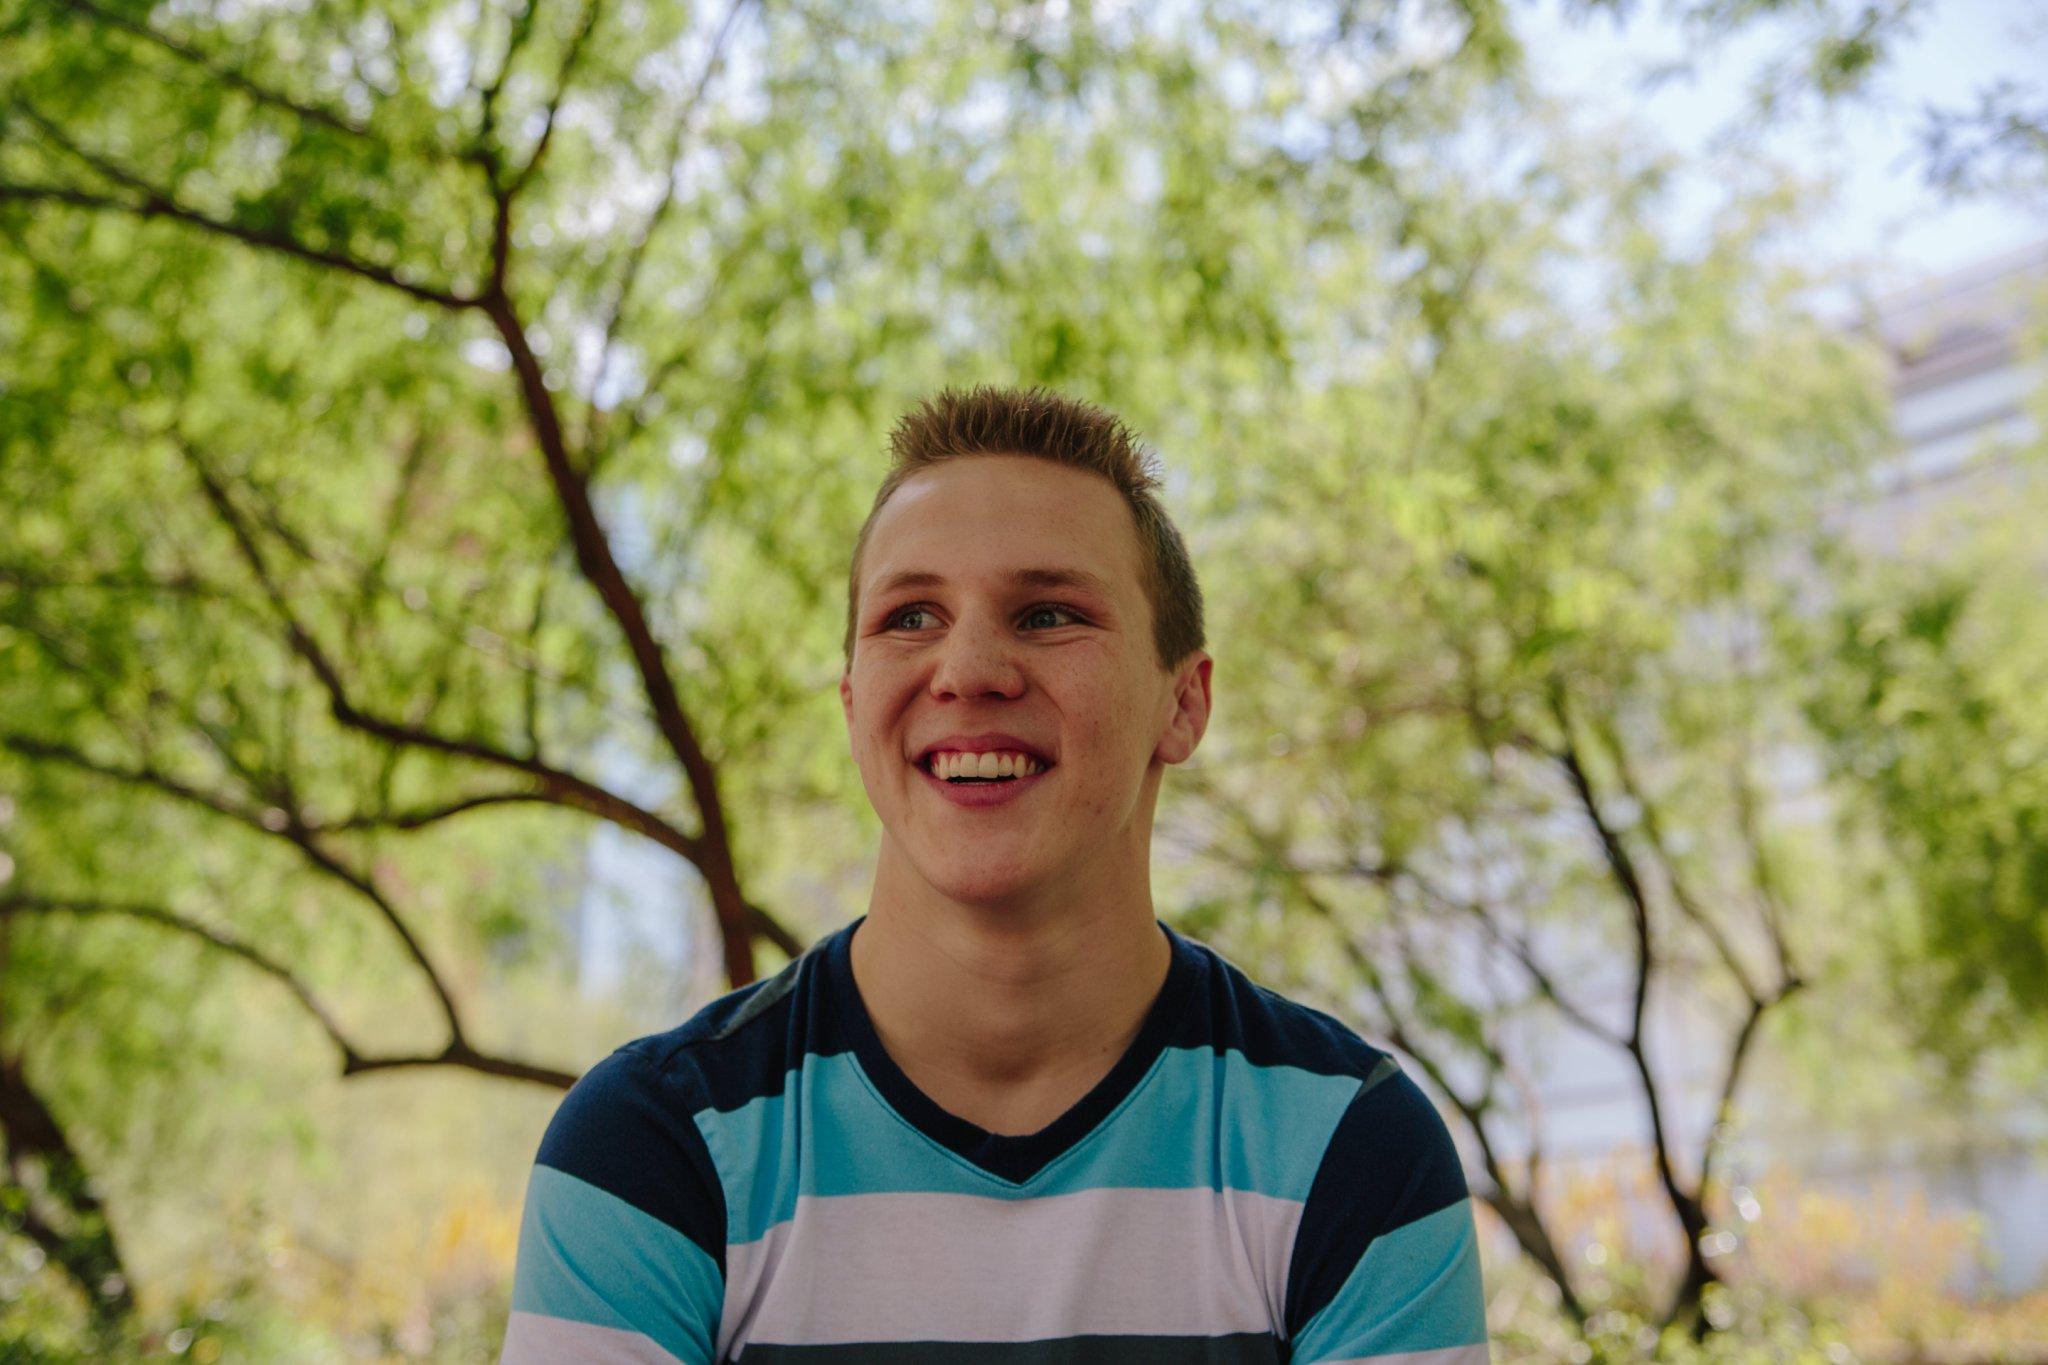 desert vista high school senior boy goofy face